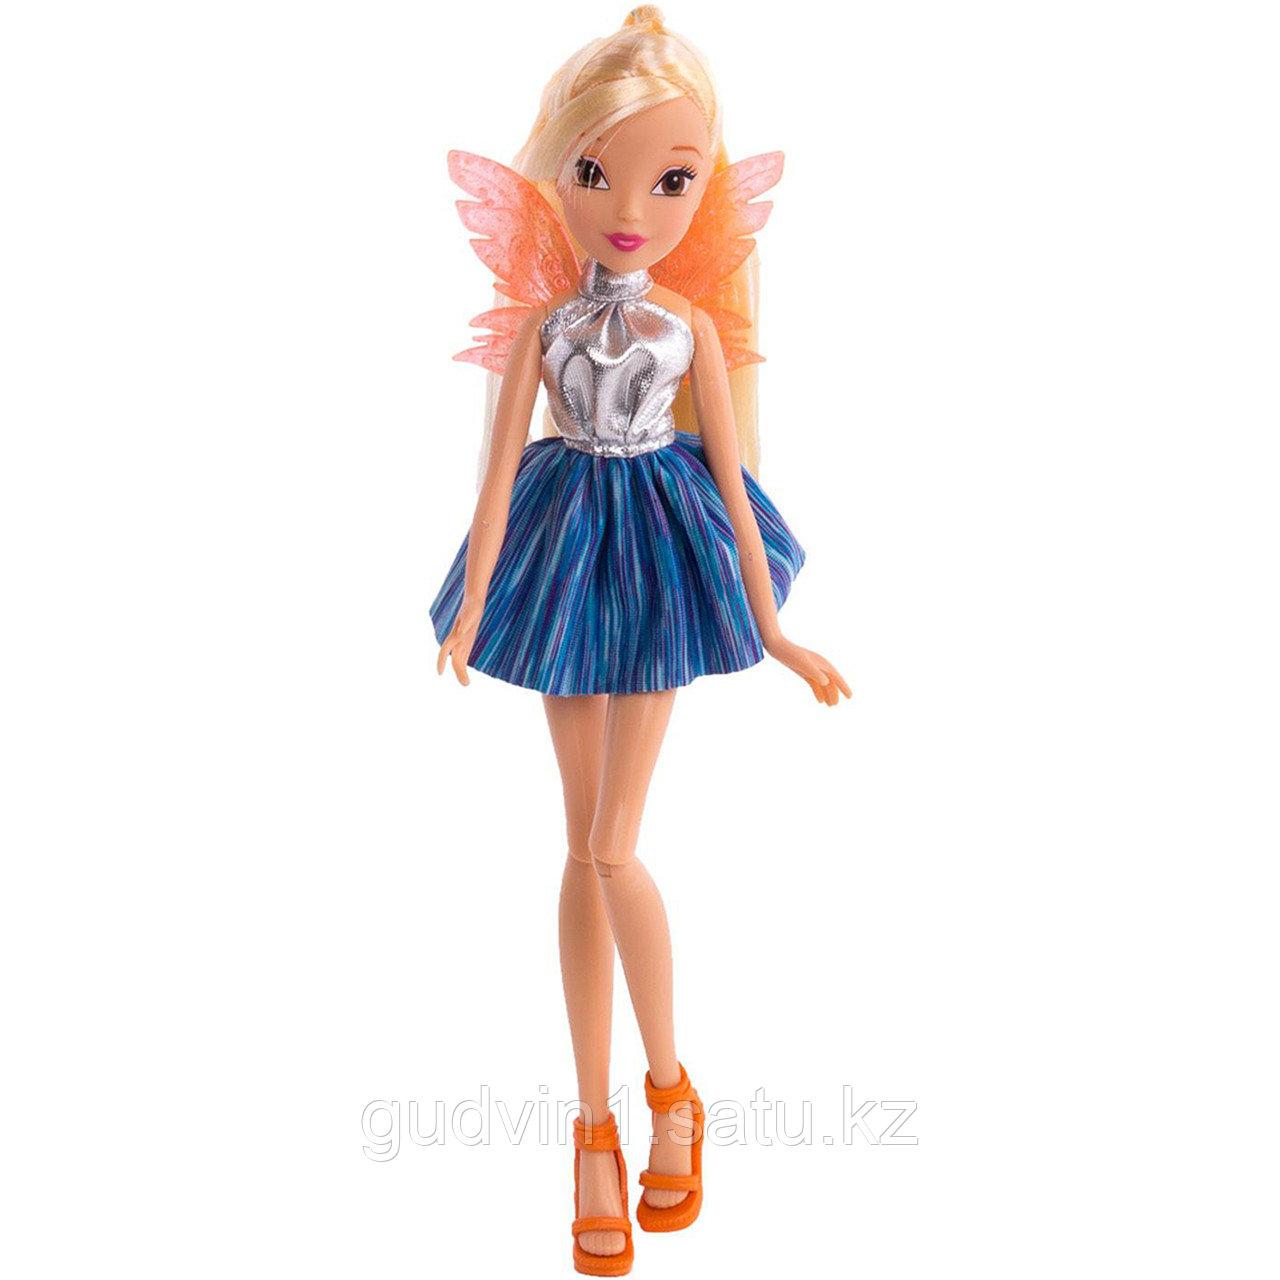 Winx Club Кукла Рок-н-ролл Стелла IW01591803